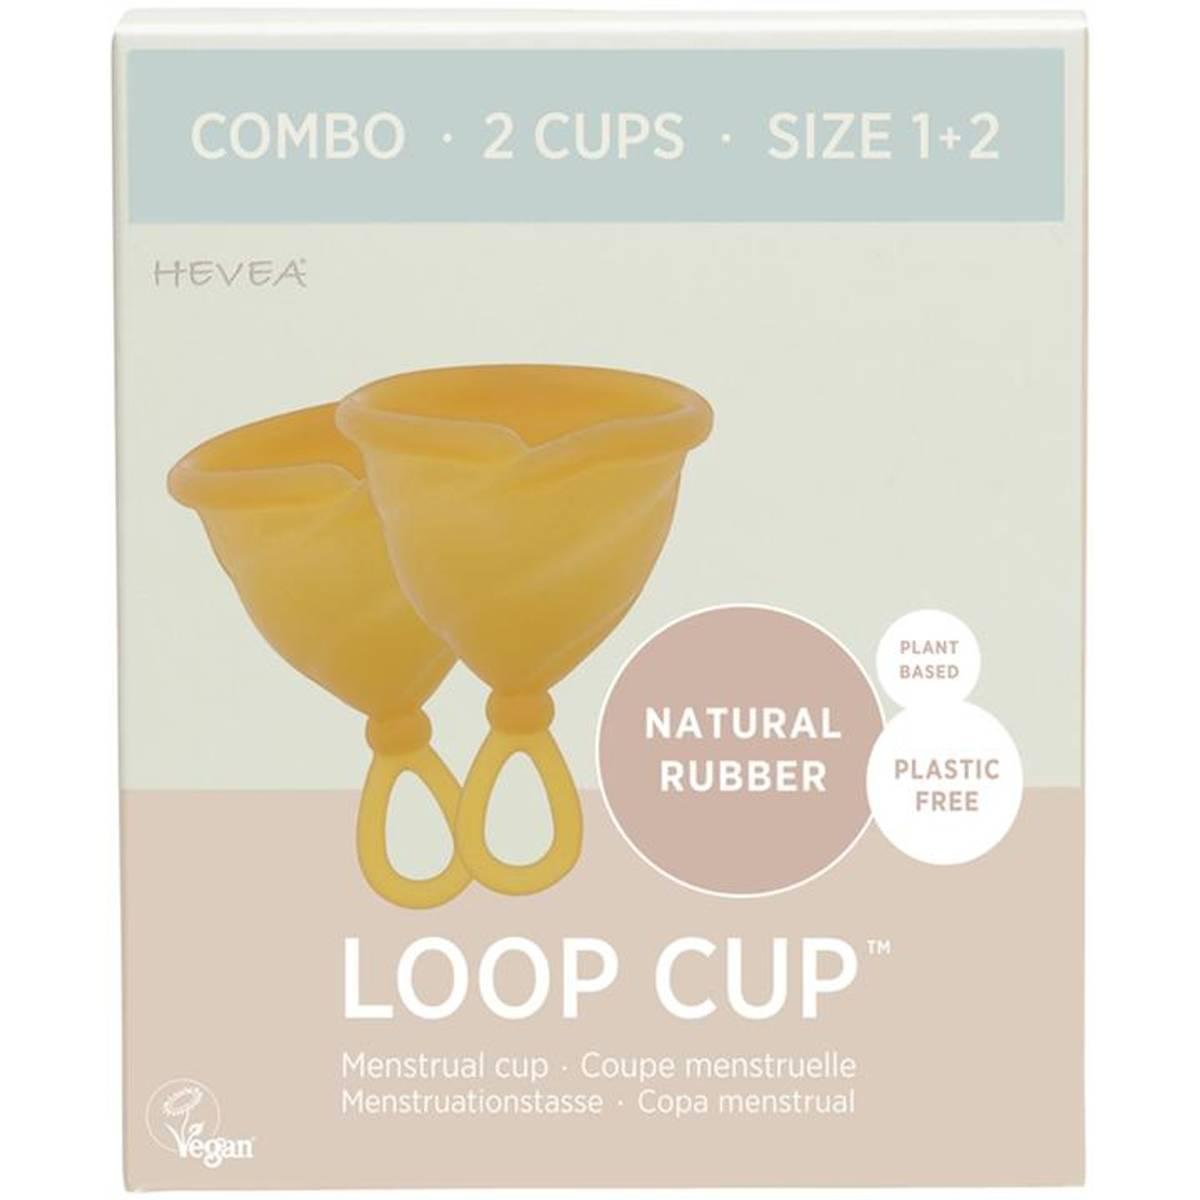 LOOP CUP COMBO str.1+2, menskopp i naturgummi / Hevea